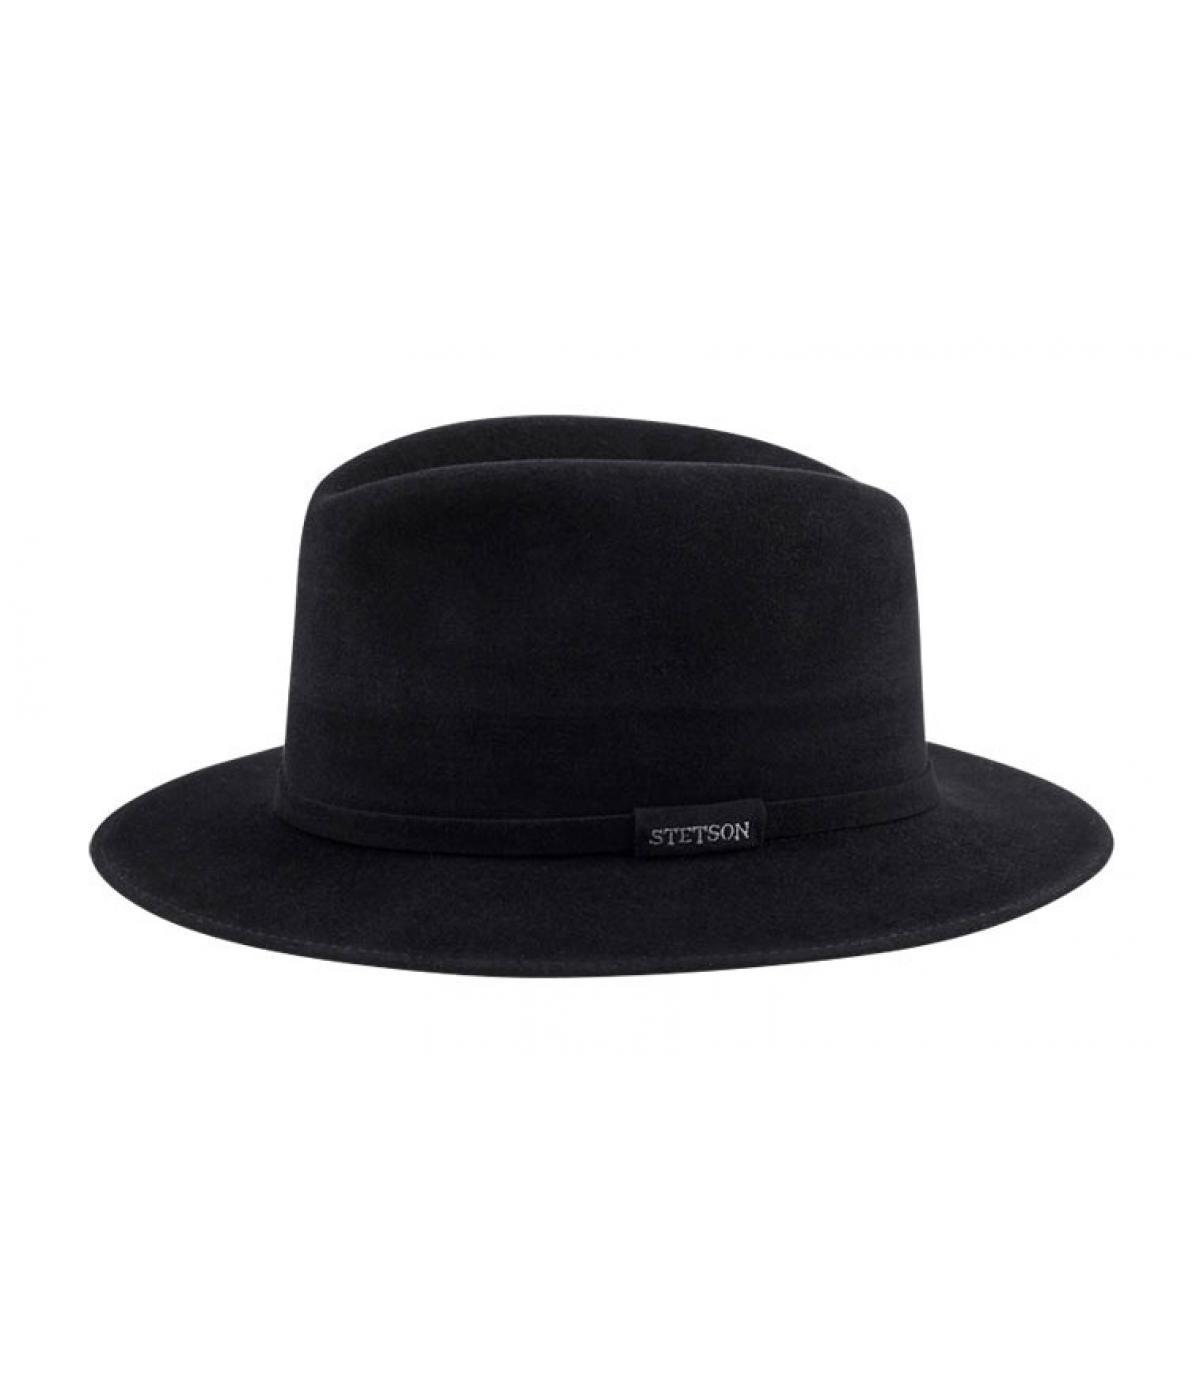 Cappello borsalino stetson